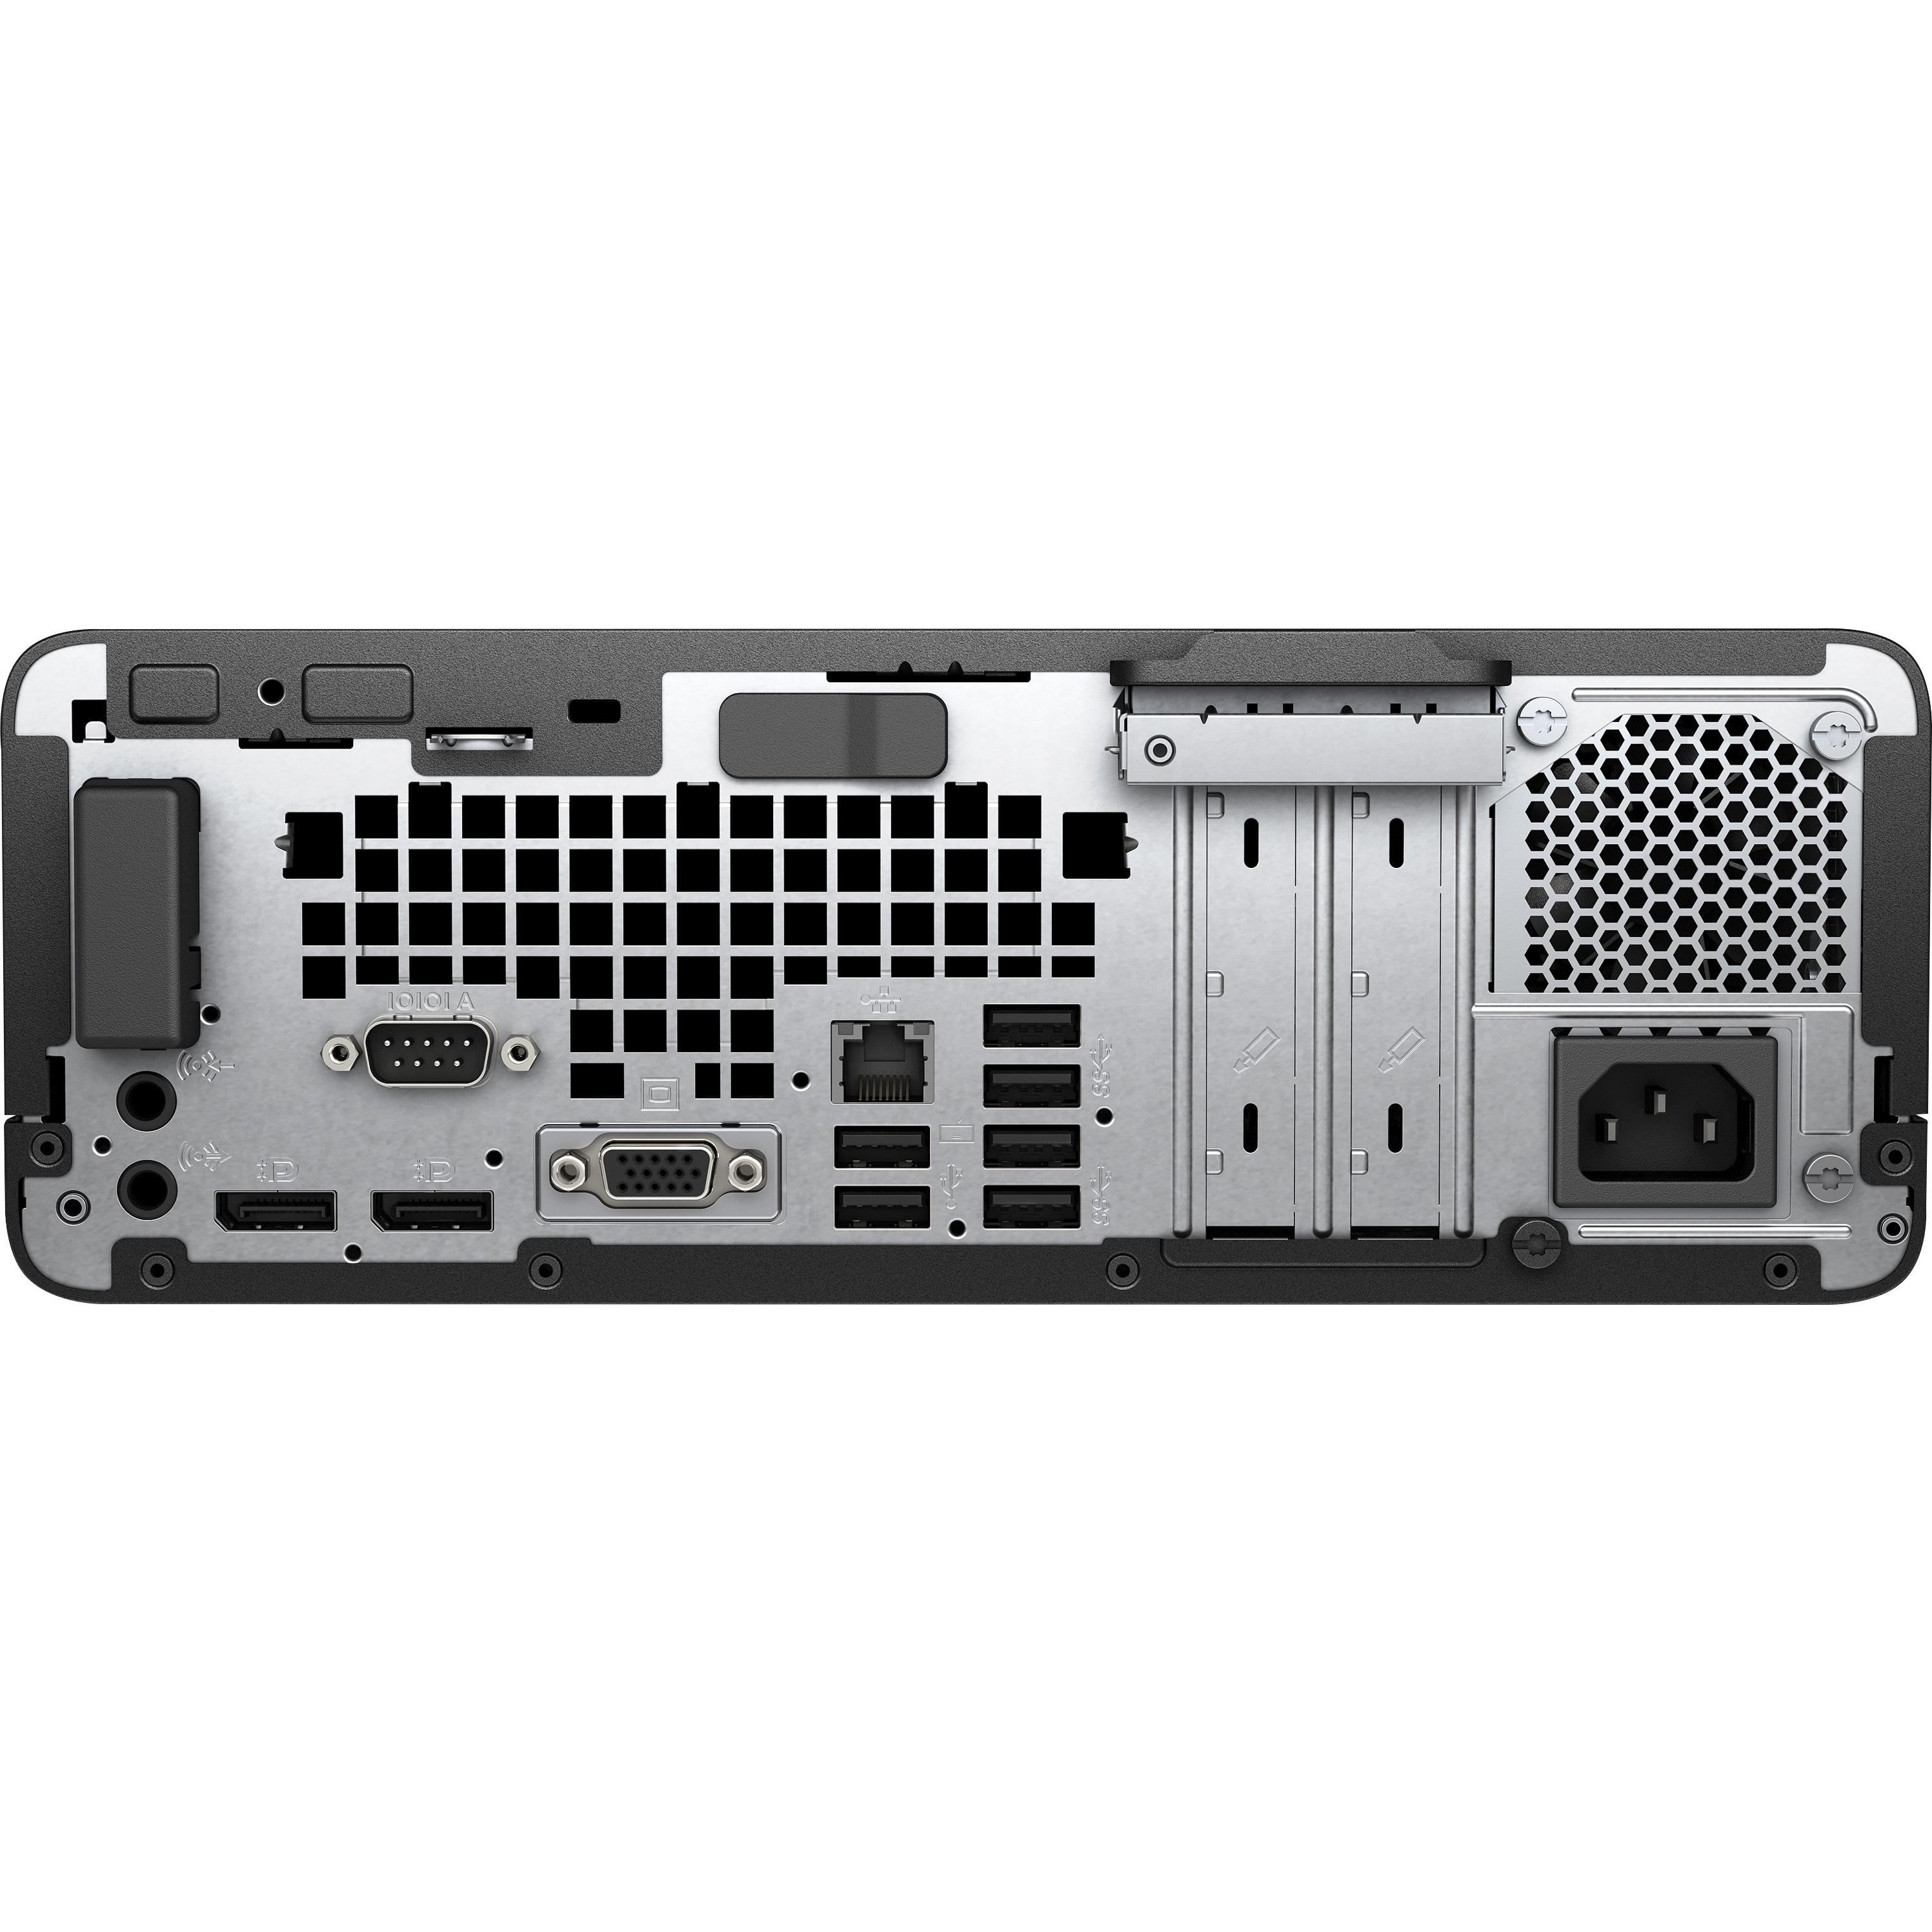 Hp Smartbuy Prodesk 400 G4 Desktop Pc: HP Business Desktop